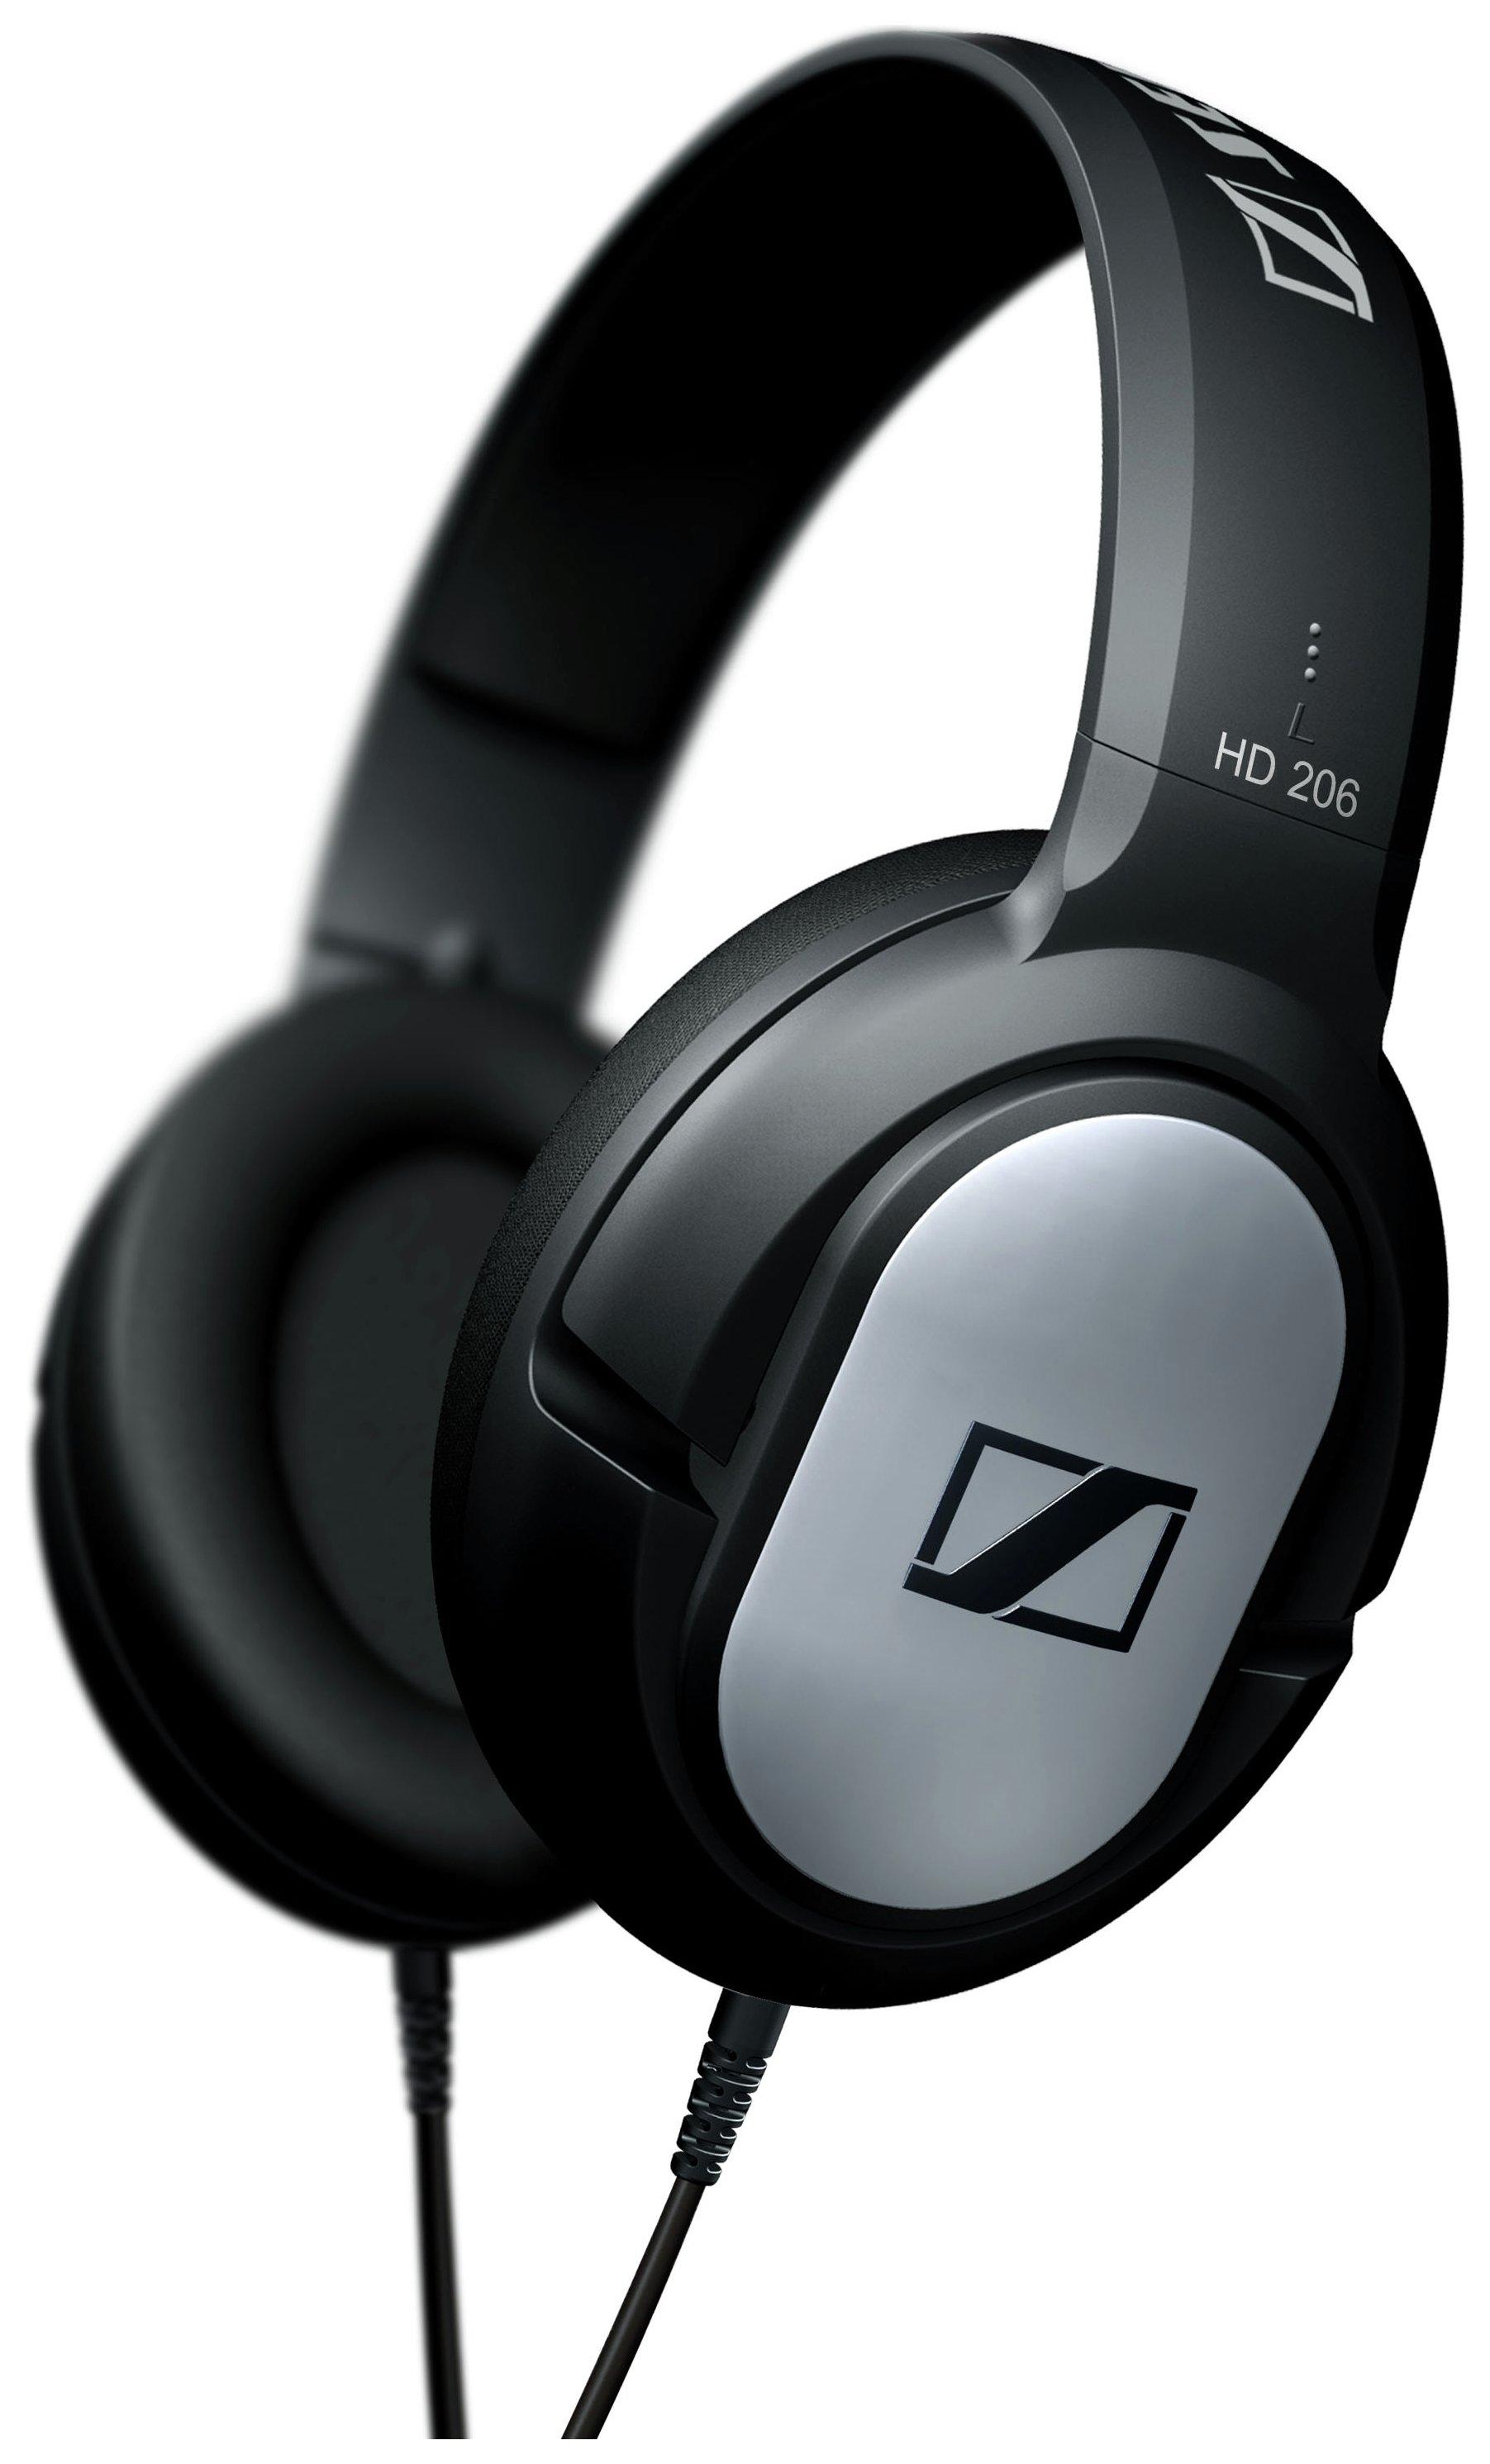 Sennheiser HD 206 Around Ear Headphones - Black